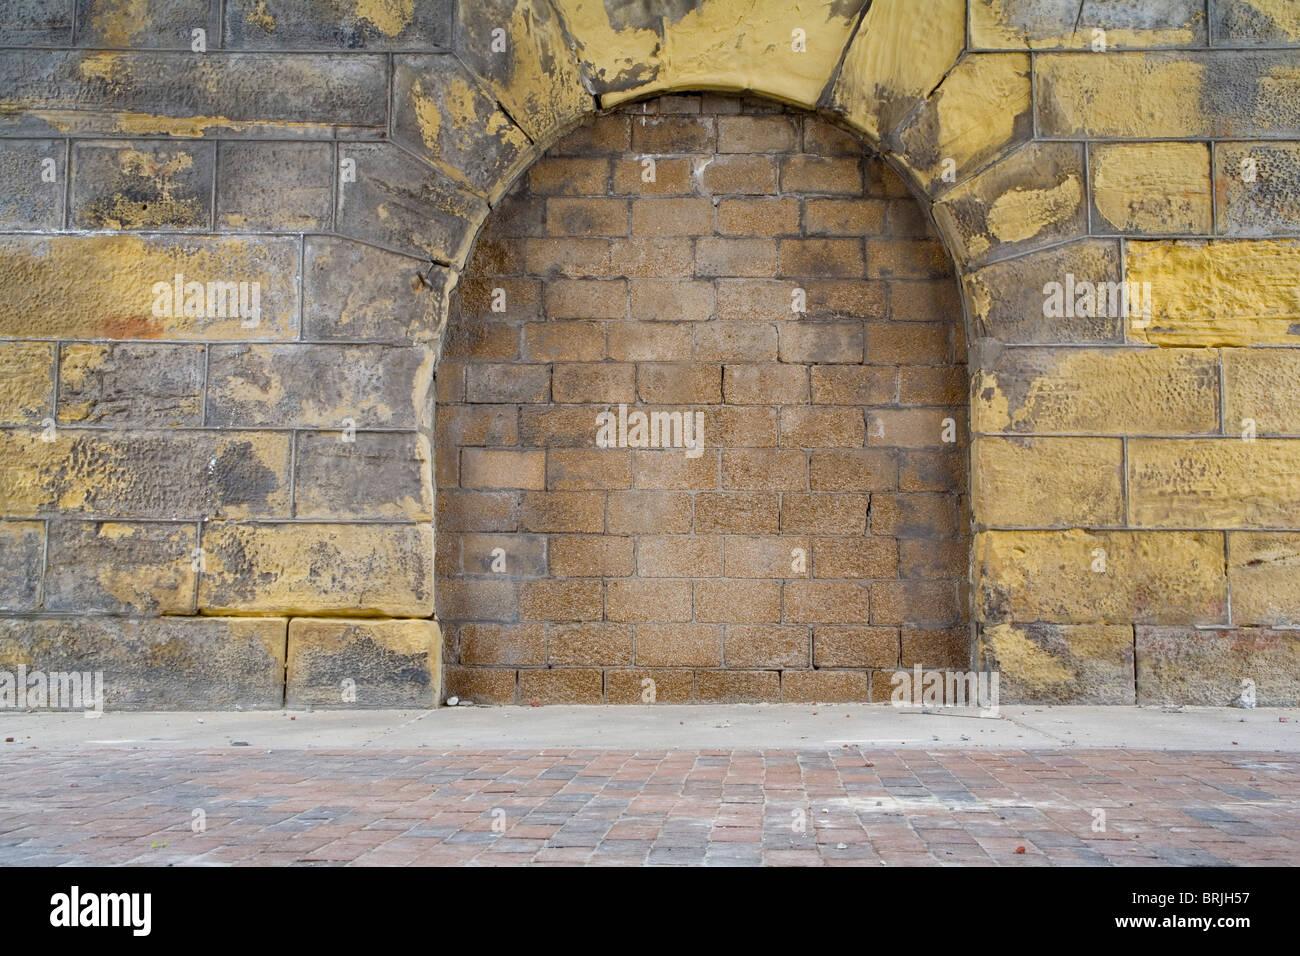 Arching Brick Wall - Stock Image